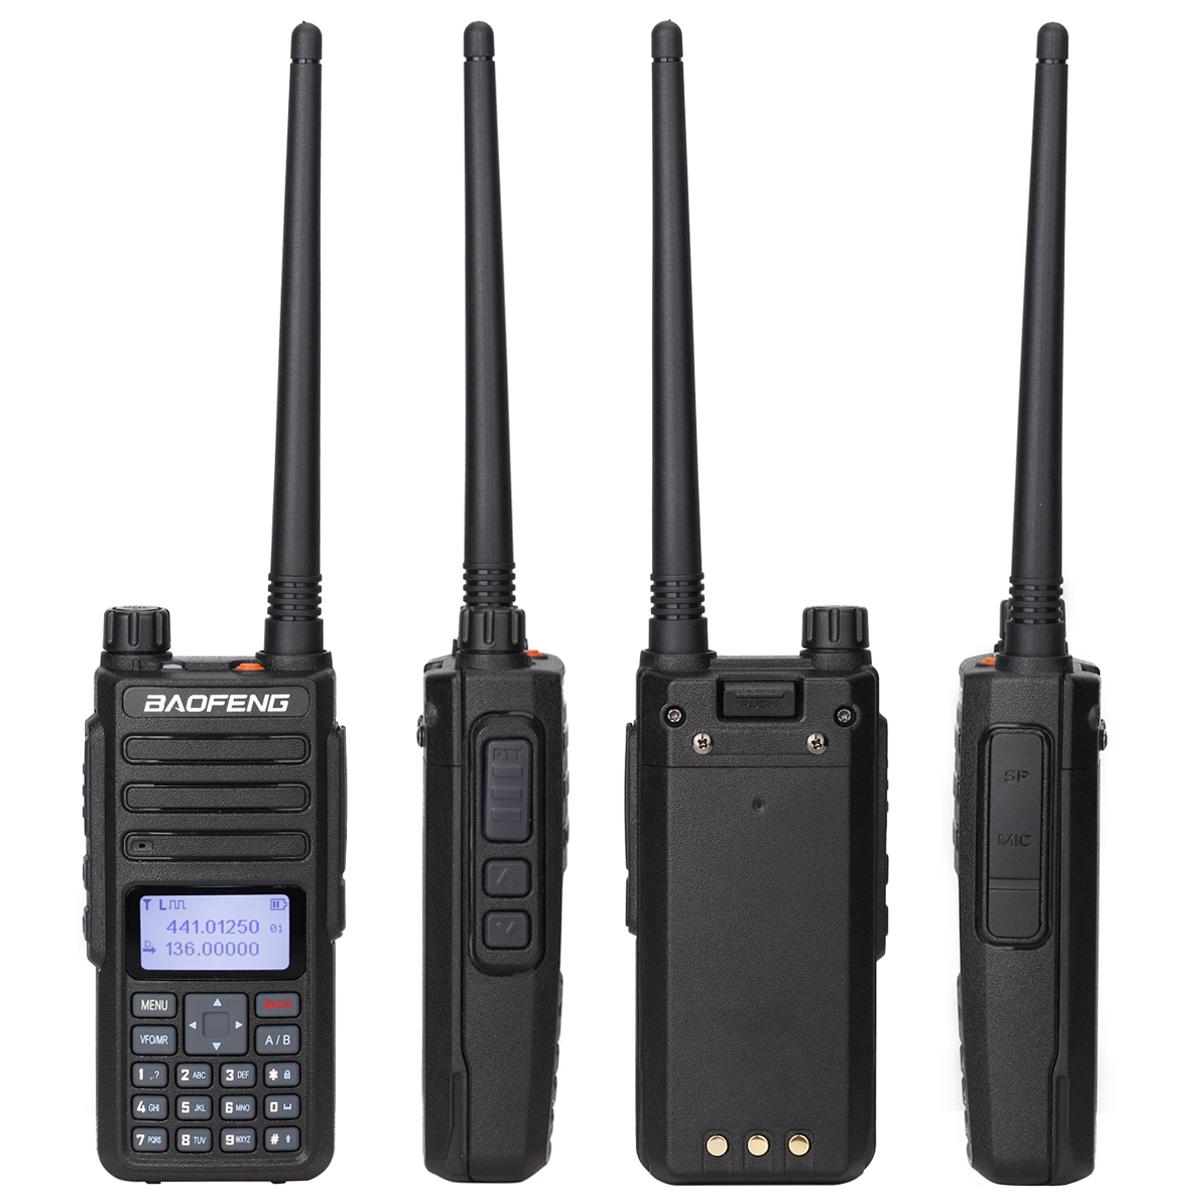 Baofeng DM 860 ดิจิตอล walkie talkie ชั้น 1 และ 2 Tier II แบบ Dual Slot DMR Digital/Analog DM 1801 HAM Two WAY วิทยุ